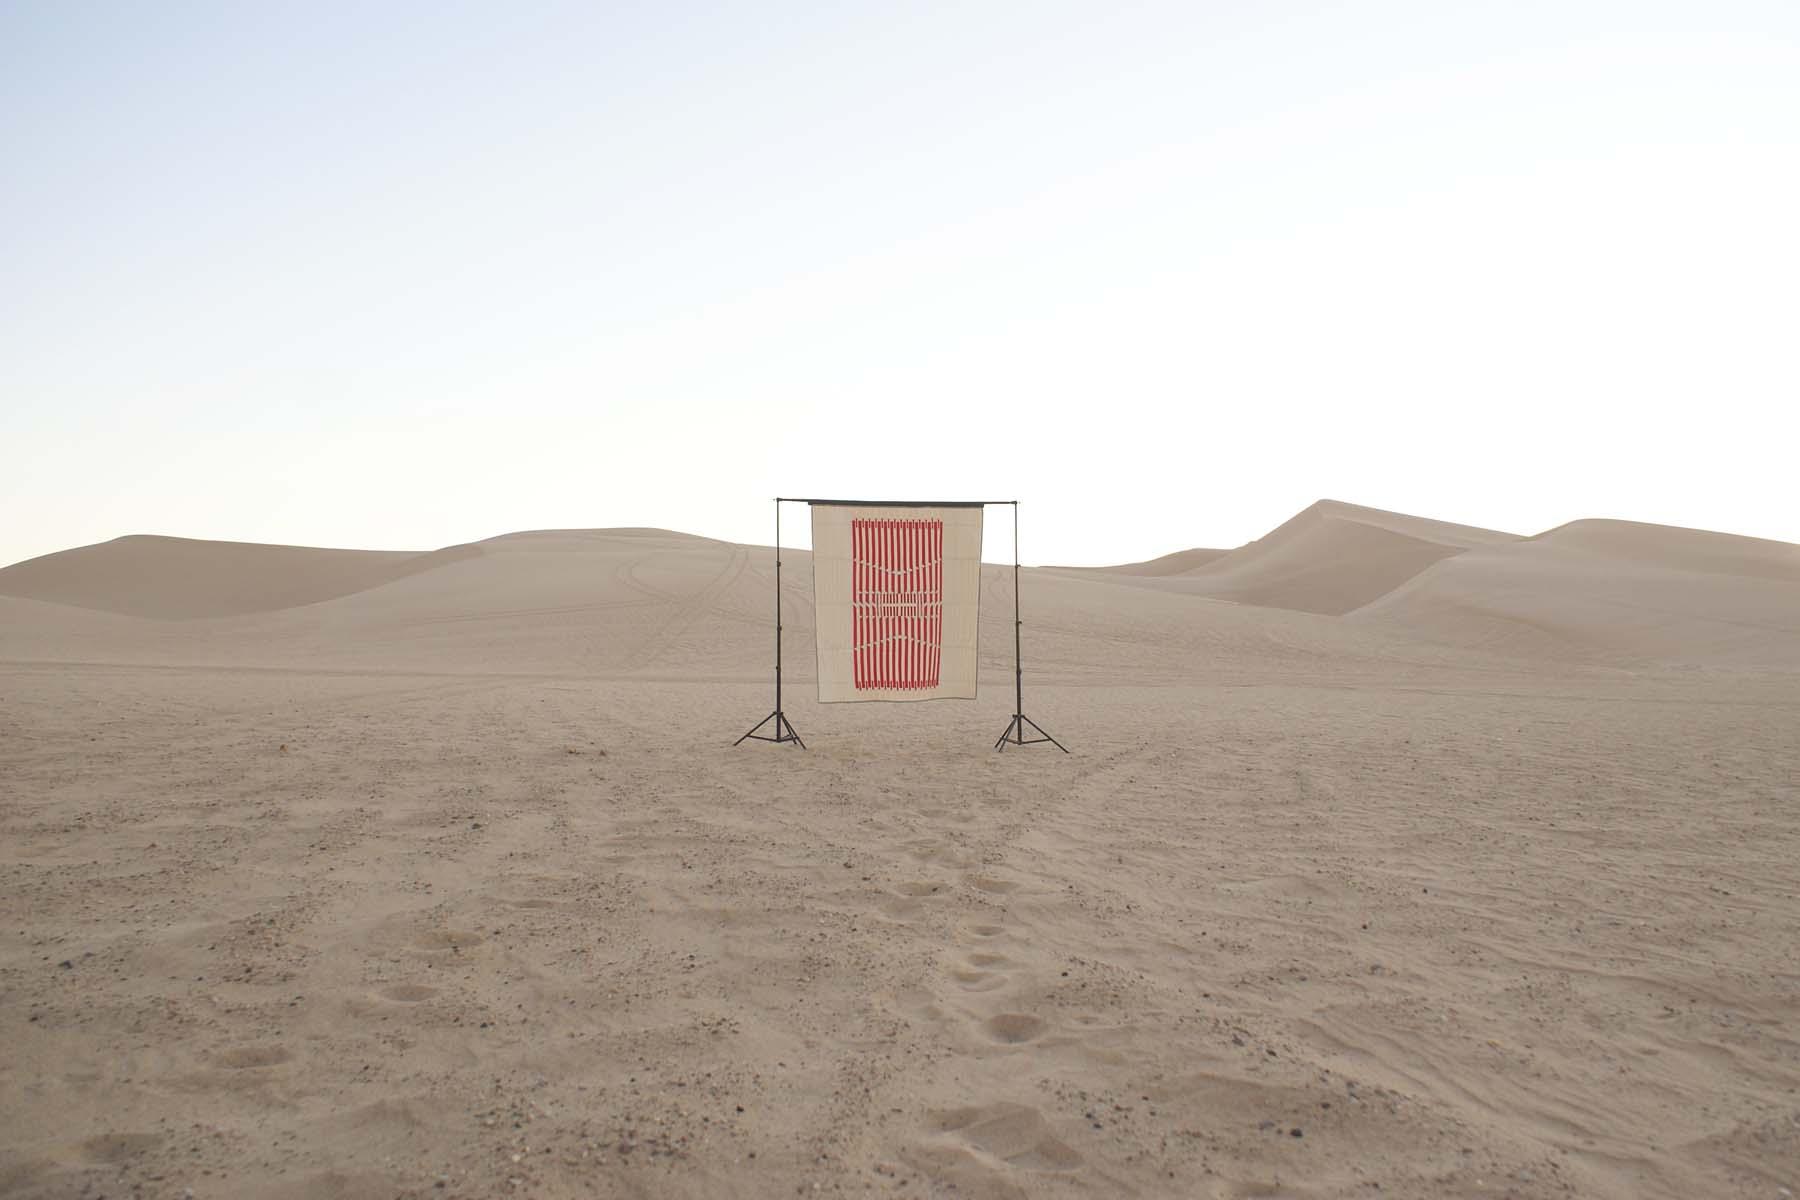 M.Callahan_USA_Dune_5.jpg